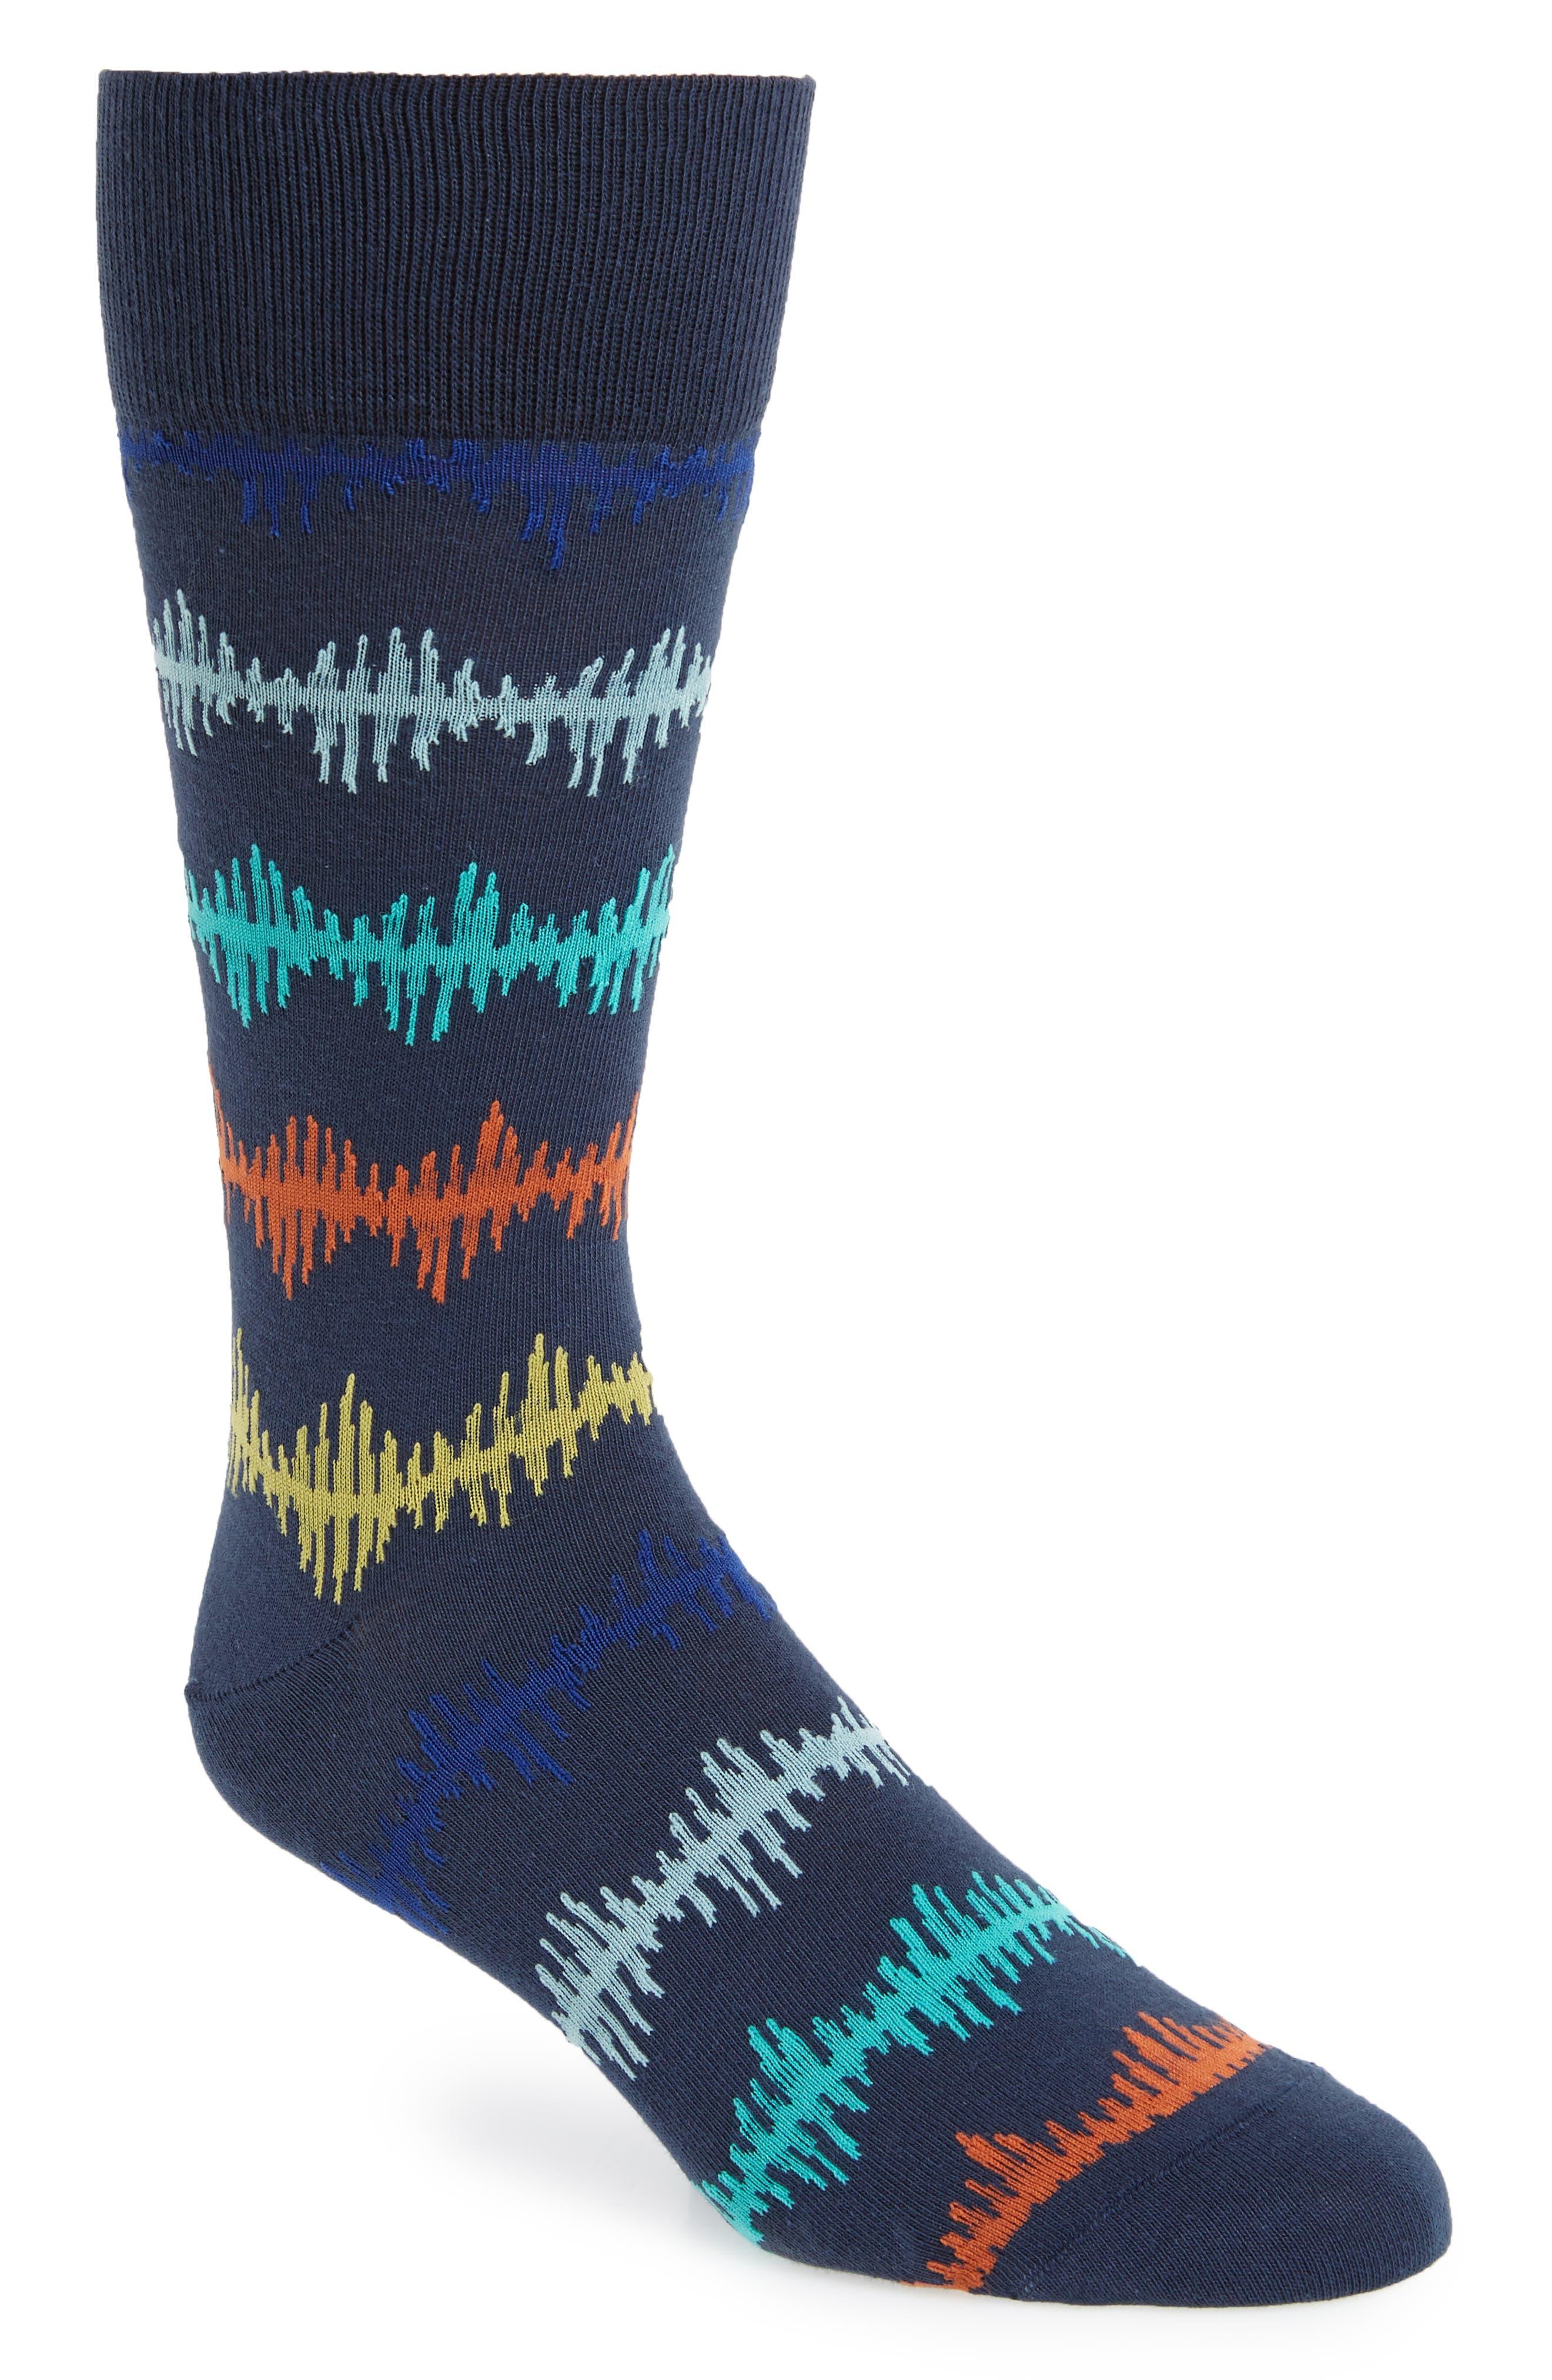 Pulse Wave Socks,                         Main,                         color, Navy/ Orange